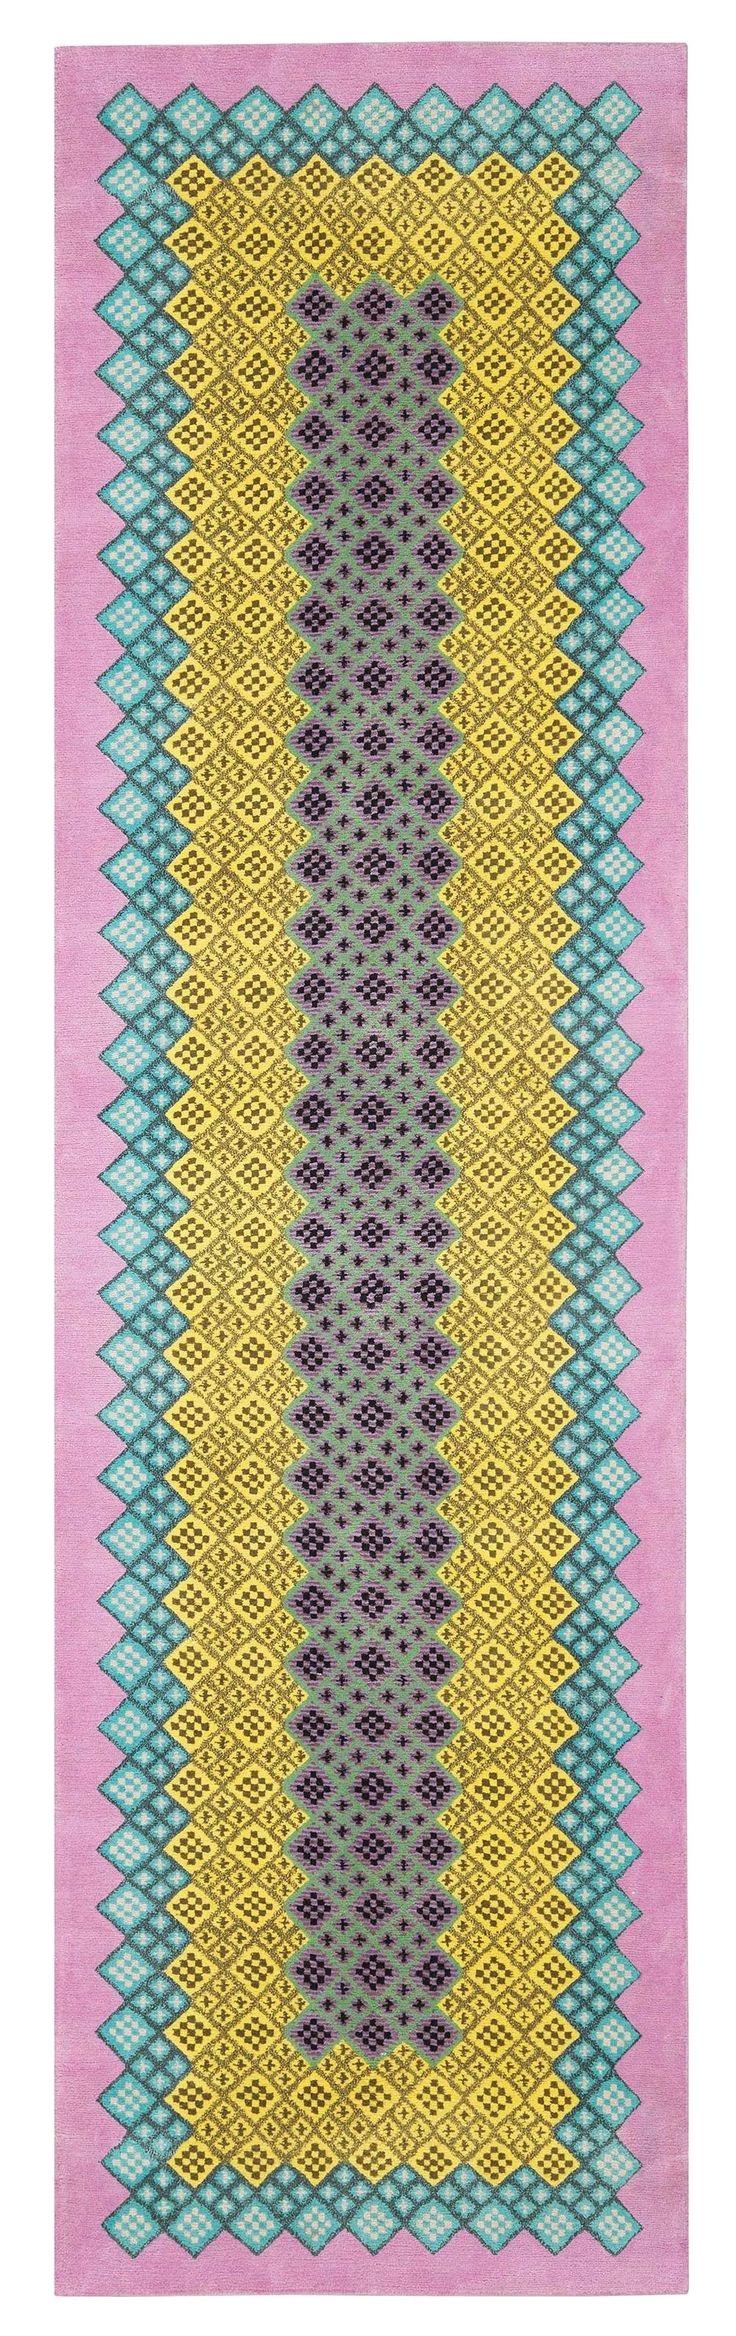 harrington by jonathan saunders the rug company